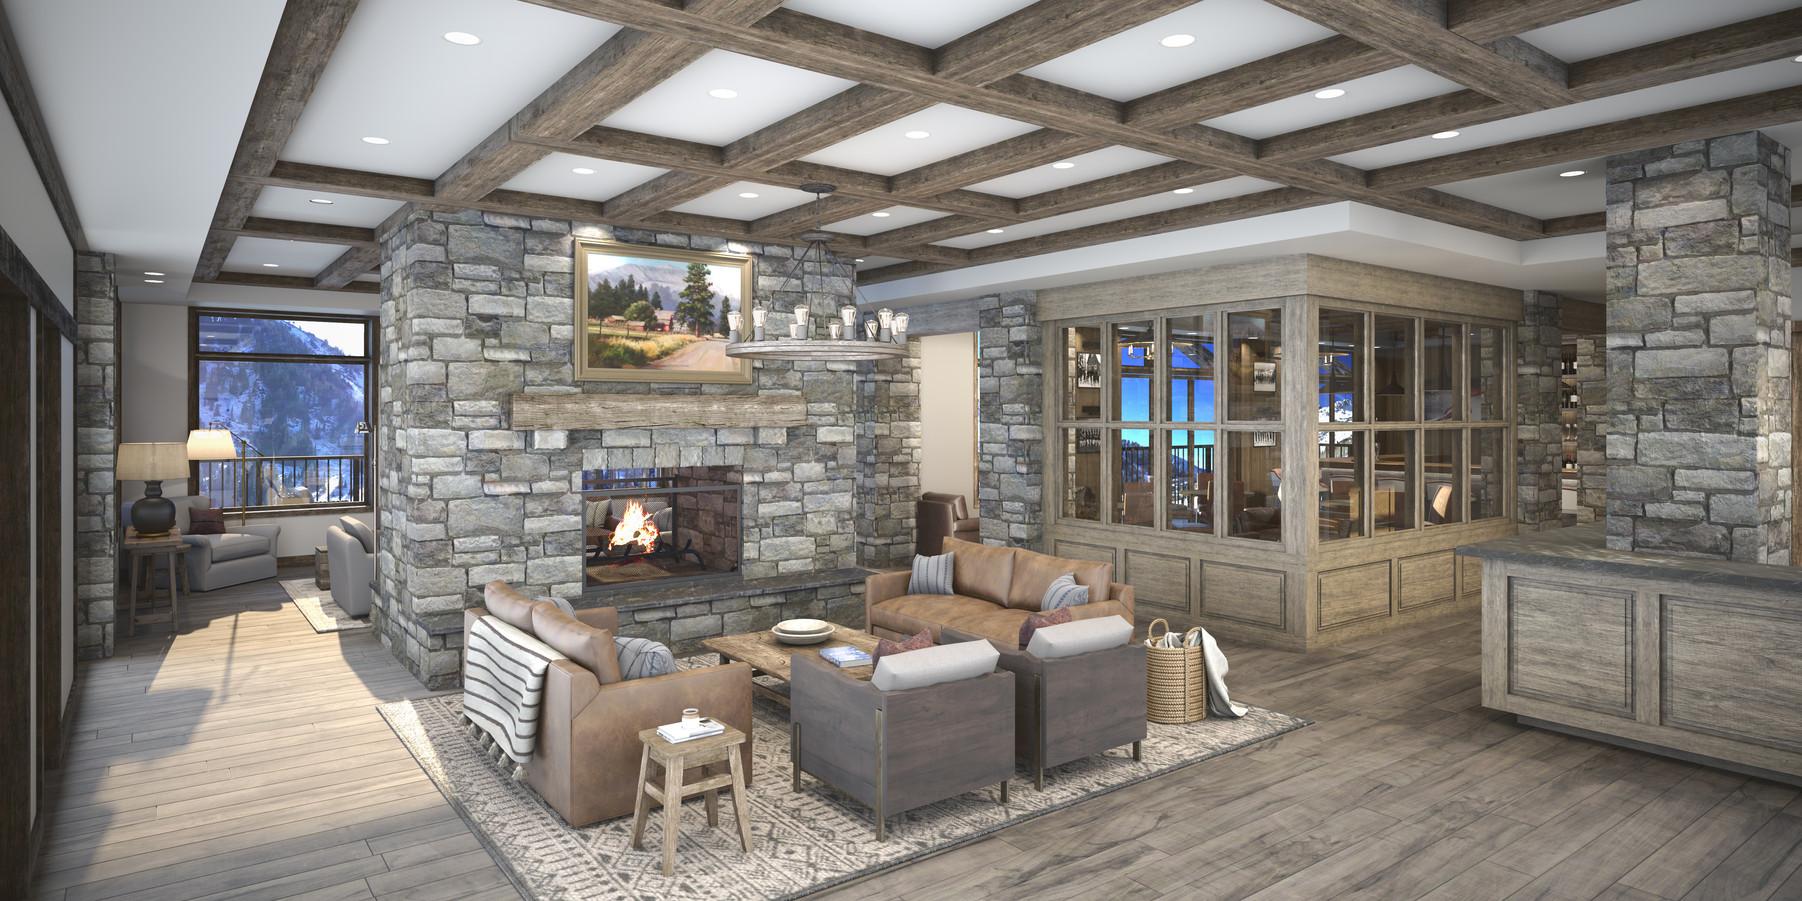 The Snowpine Lodge Lobby